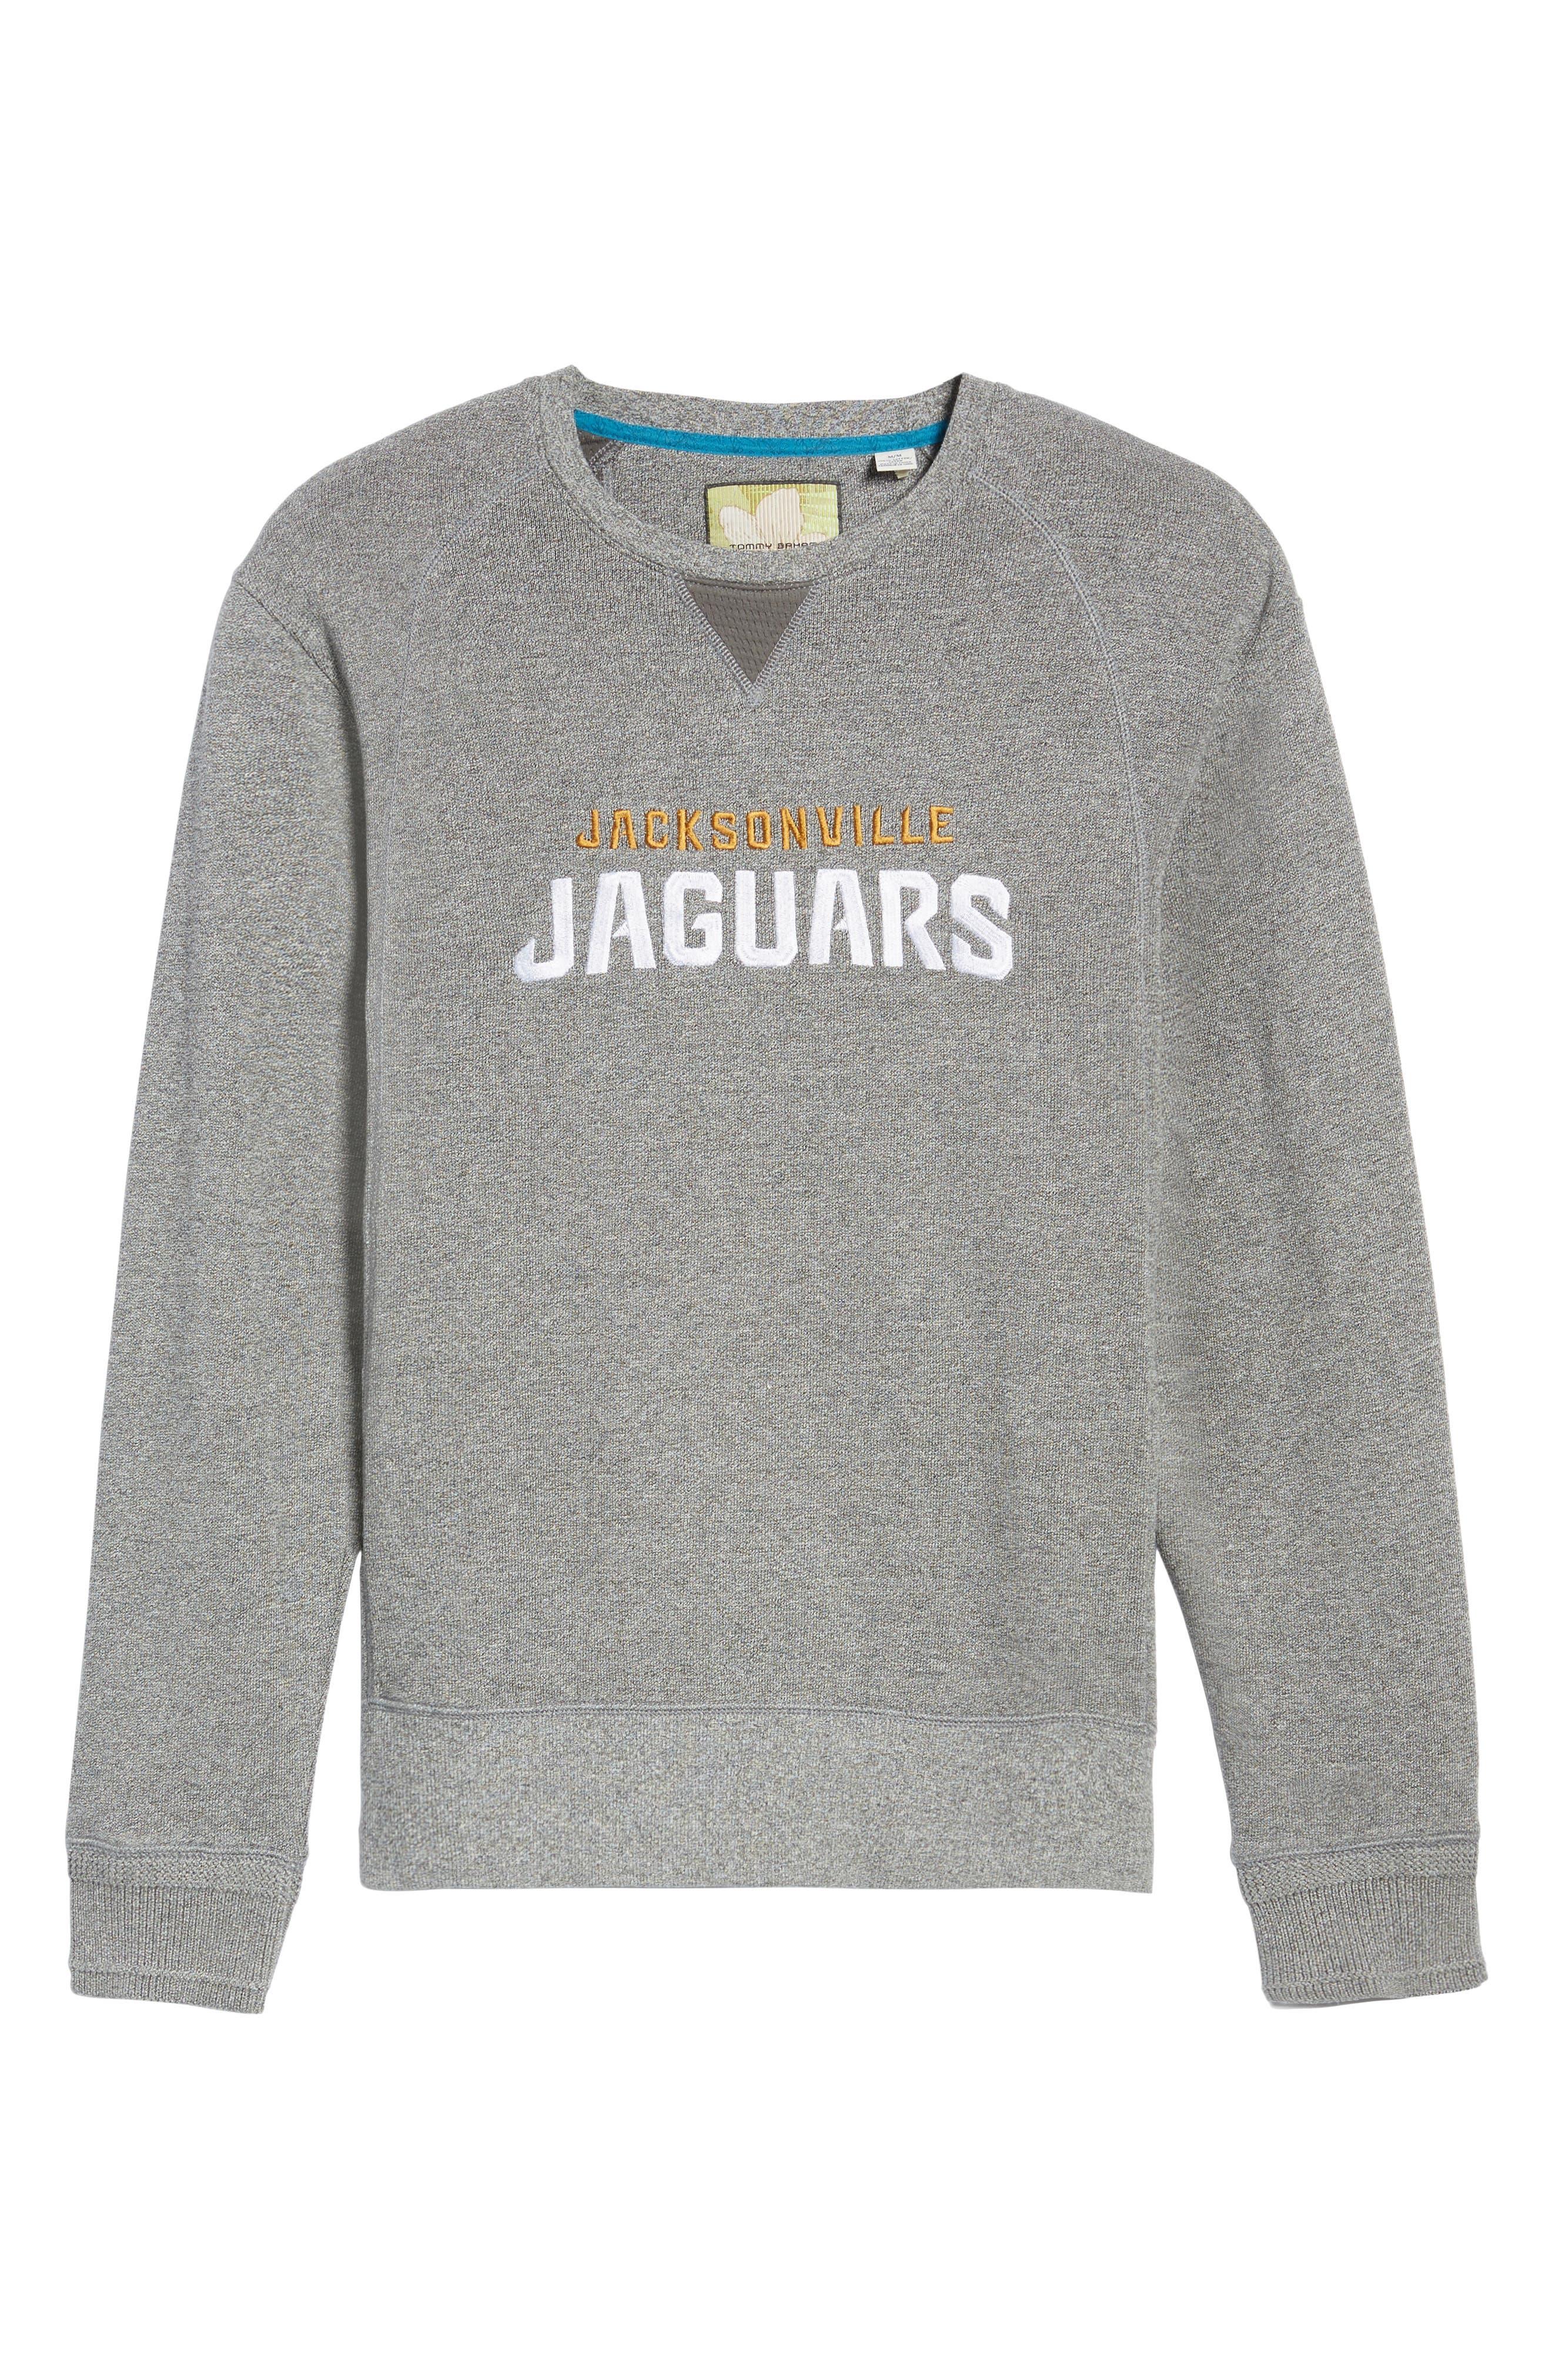 NFL Stitch of Liberty Embroidered Crewneck Sweatshirt,                             Alternate thumbnail 168, color,